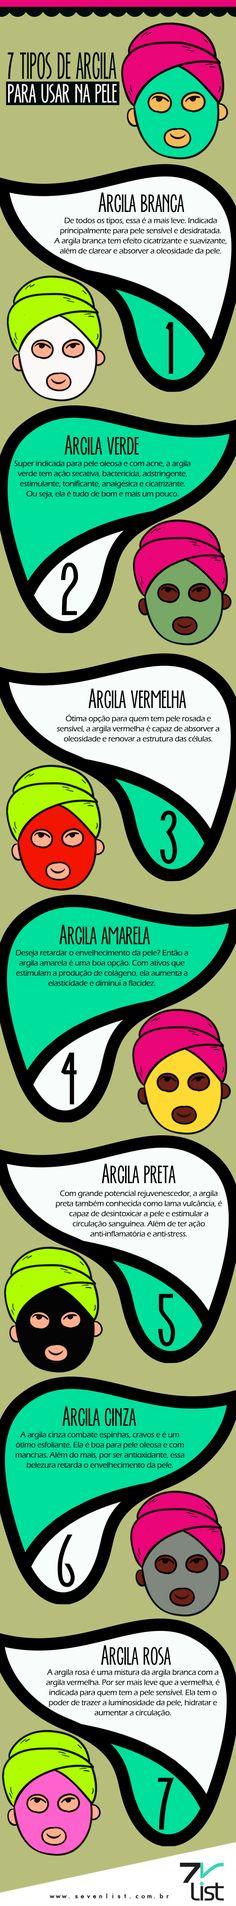 Argila, como usar a Argiloterapia                                                                                                                                                                                 Mais